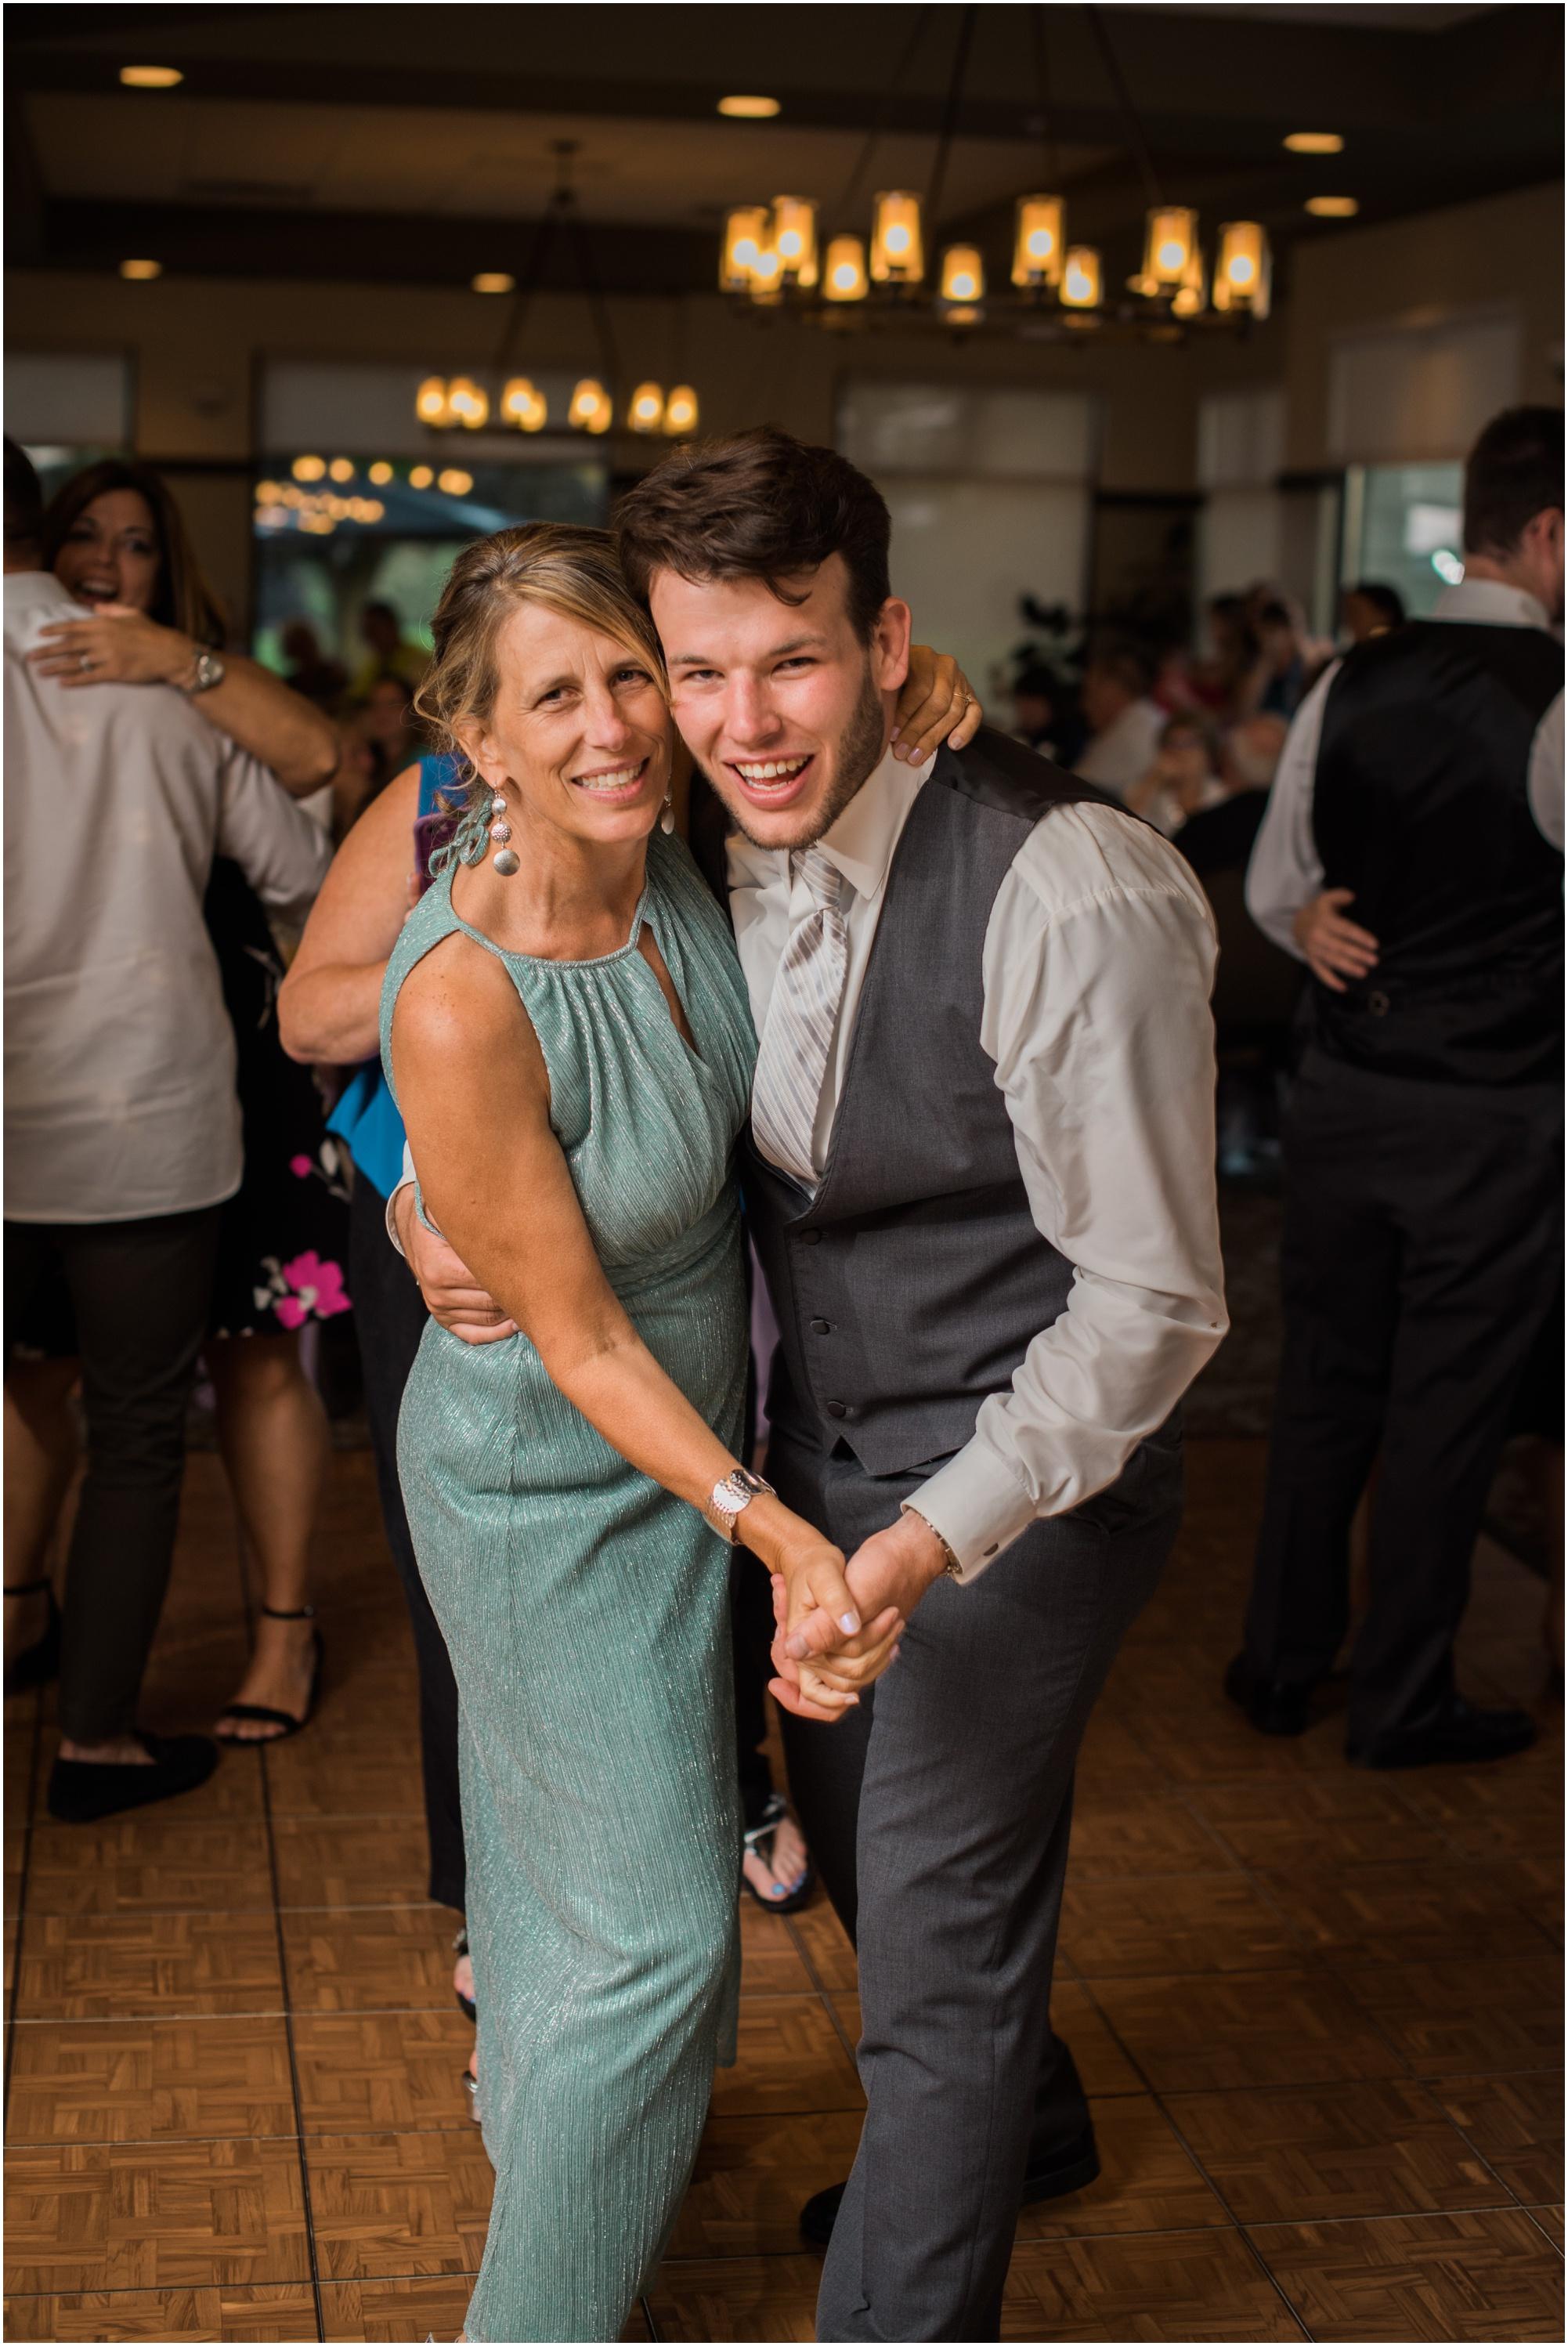 Wisconsin-Wedding-Photographer-Reedsburg-Country-Club-Kaela-and Matt-Wedding-927.jpg